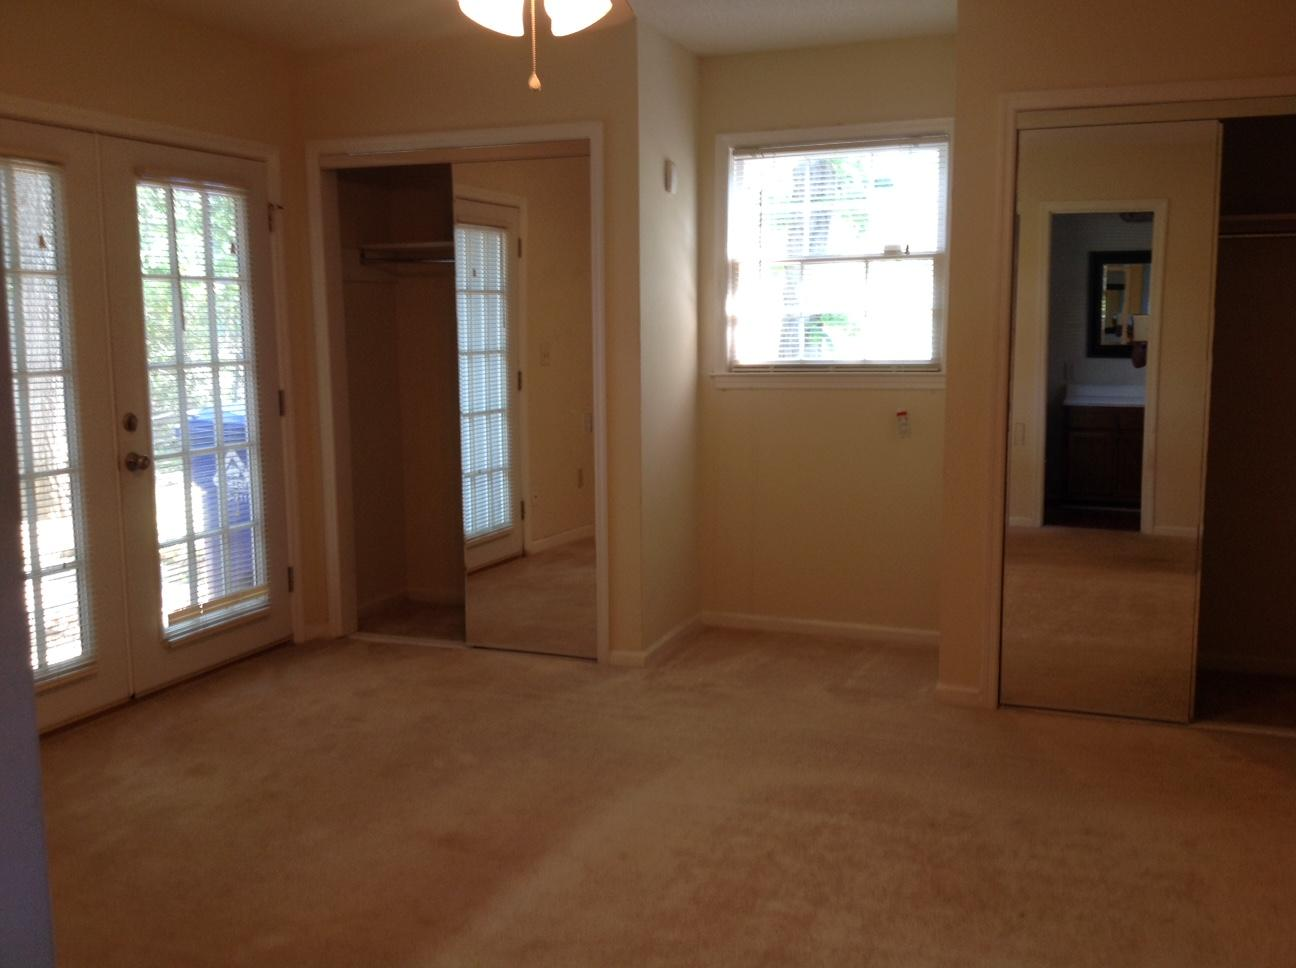 Covington Hills Homes For Sale - 5710 Saint Angela, North Charleston, SC - 16